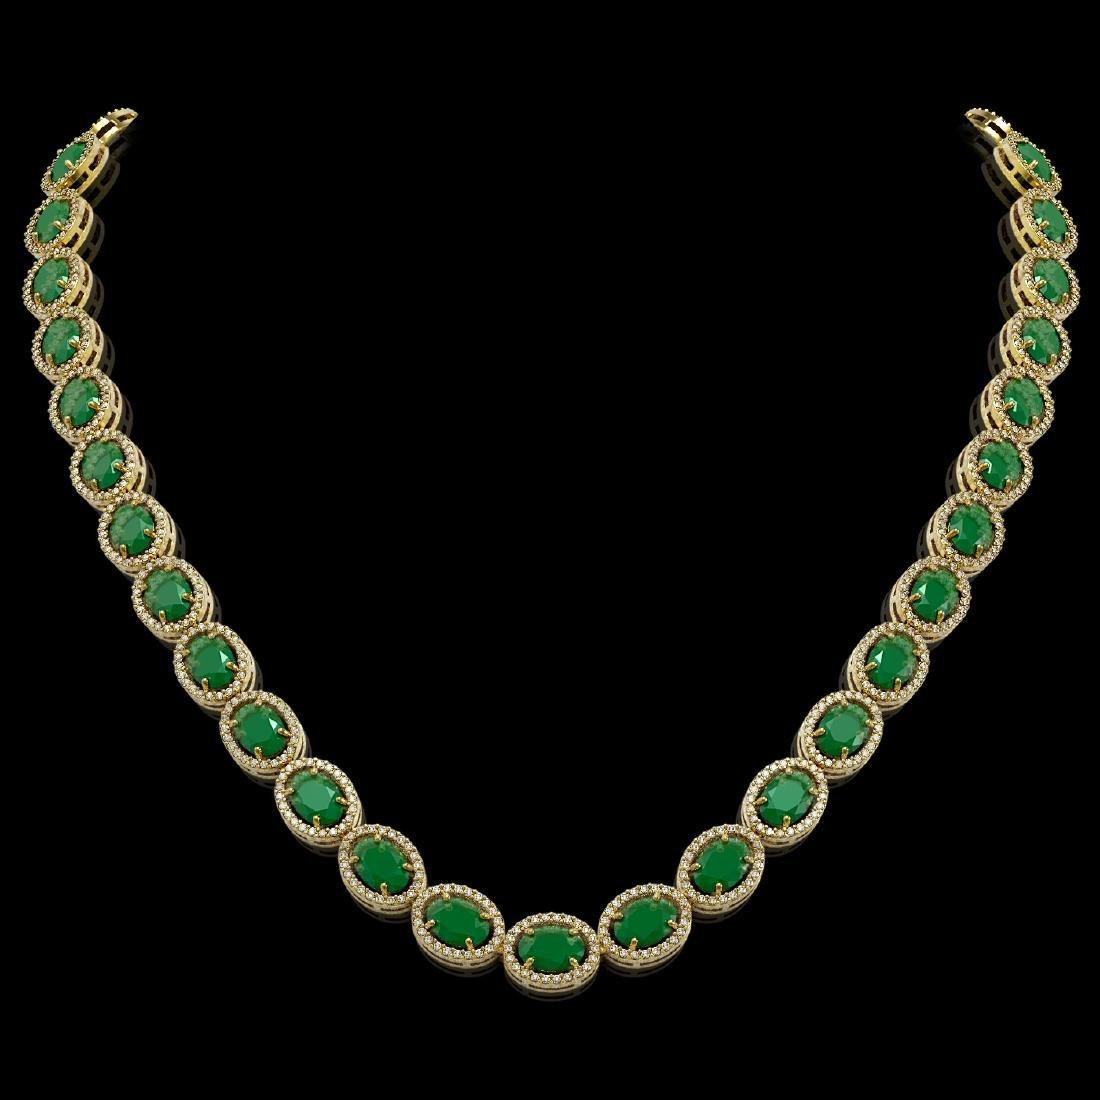 52.15 CTW Emerald & Diamond Halo Necklace 10K Yellow